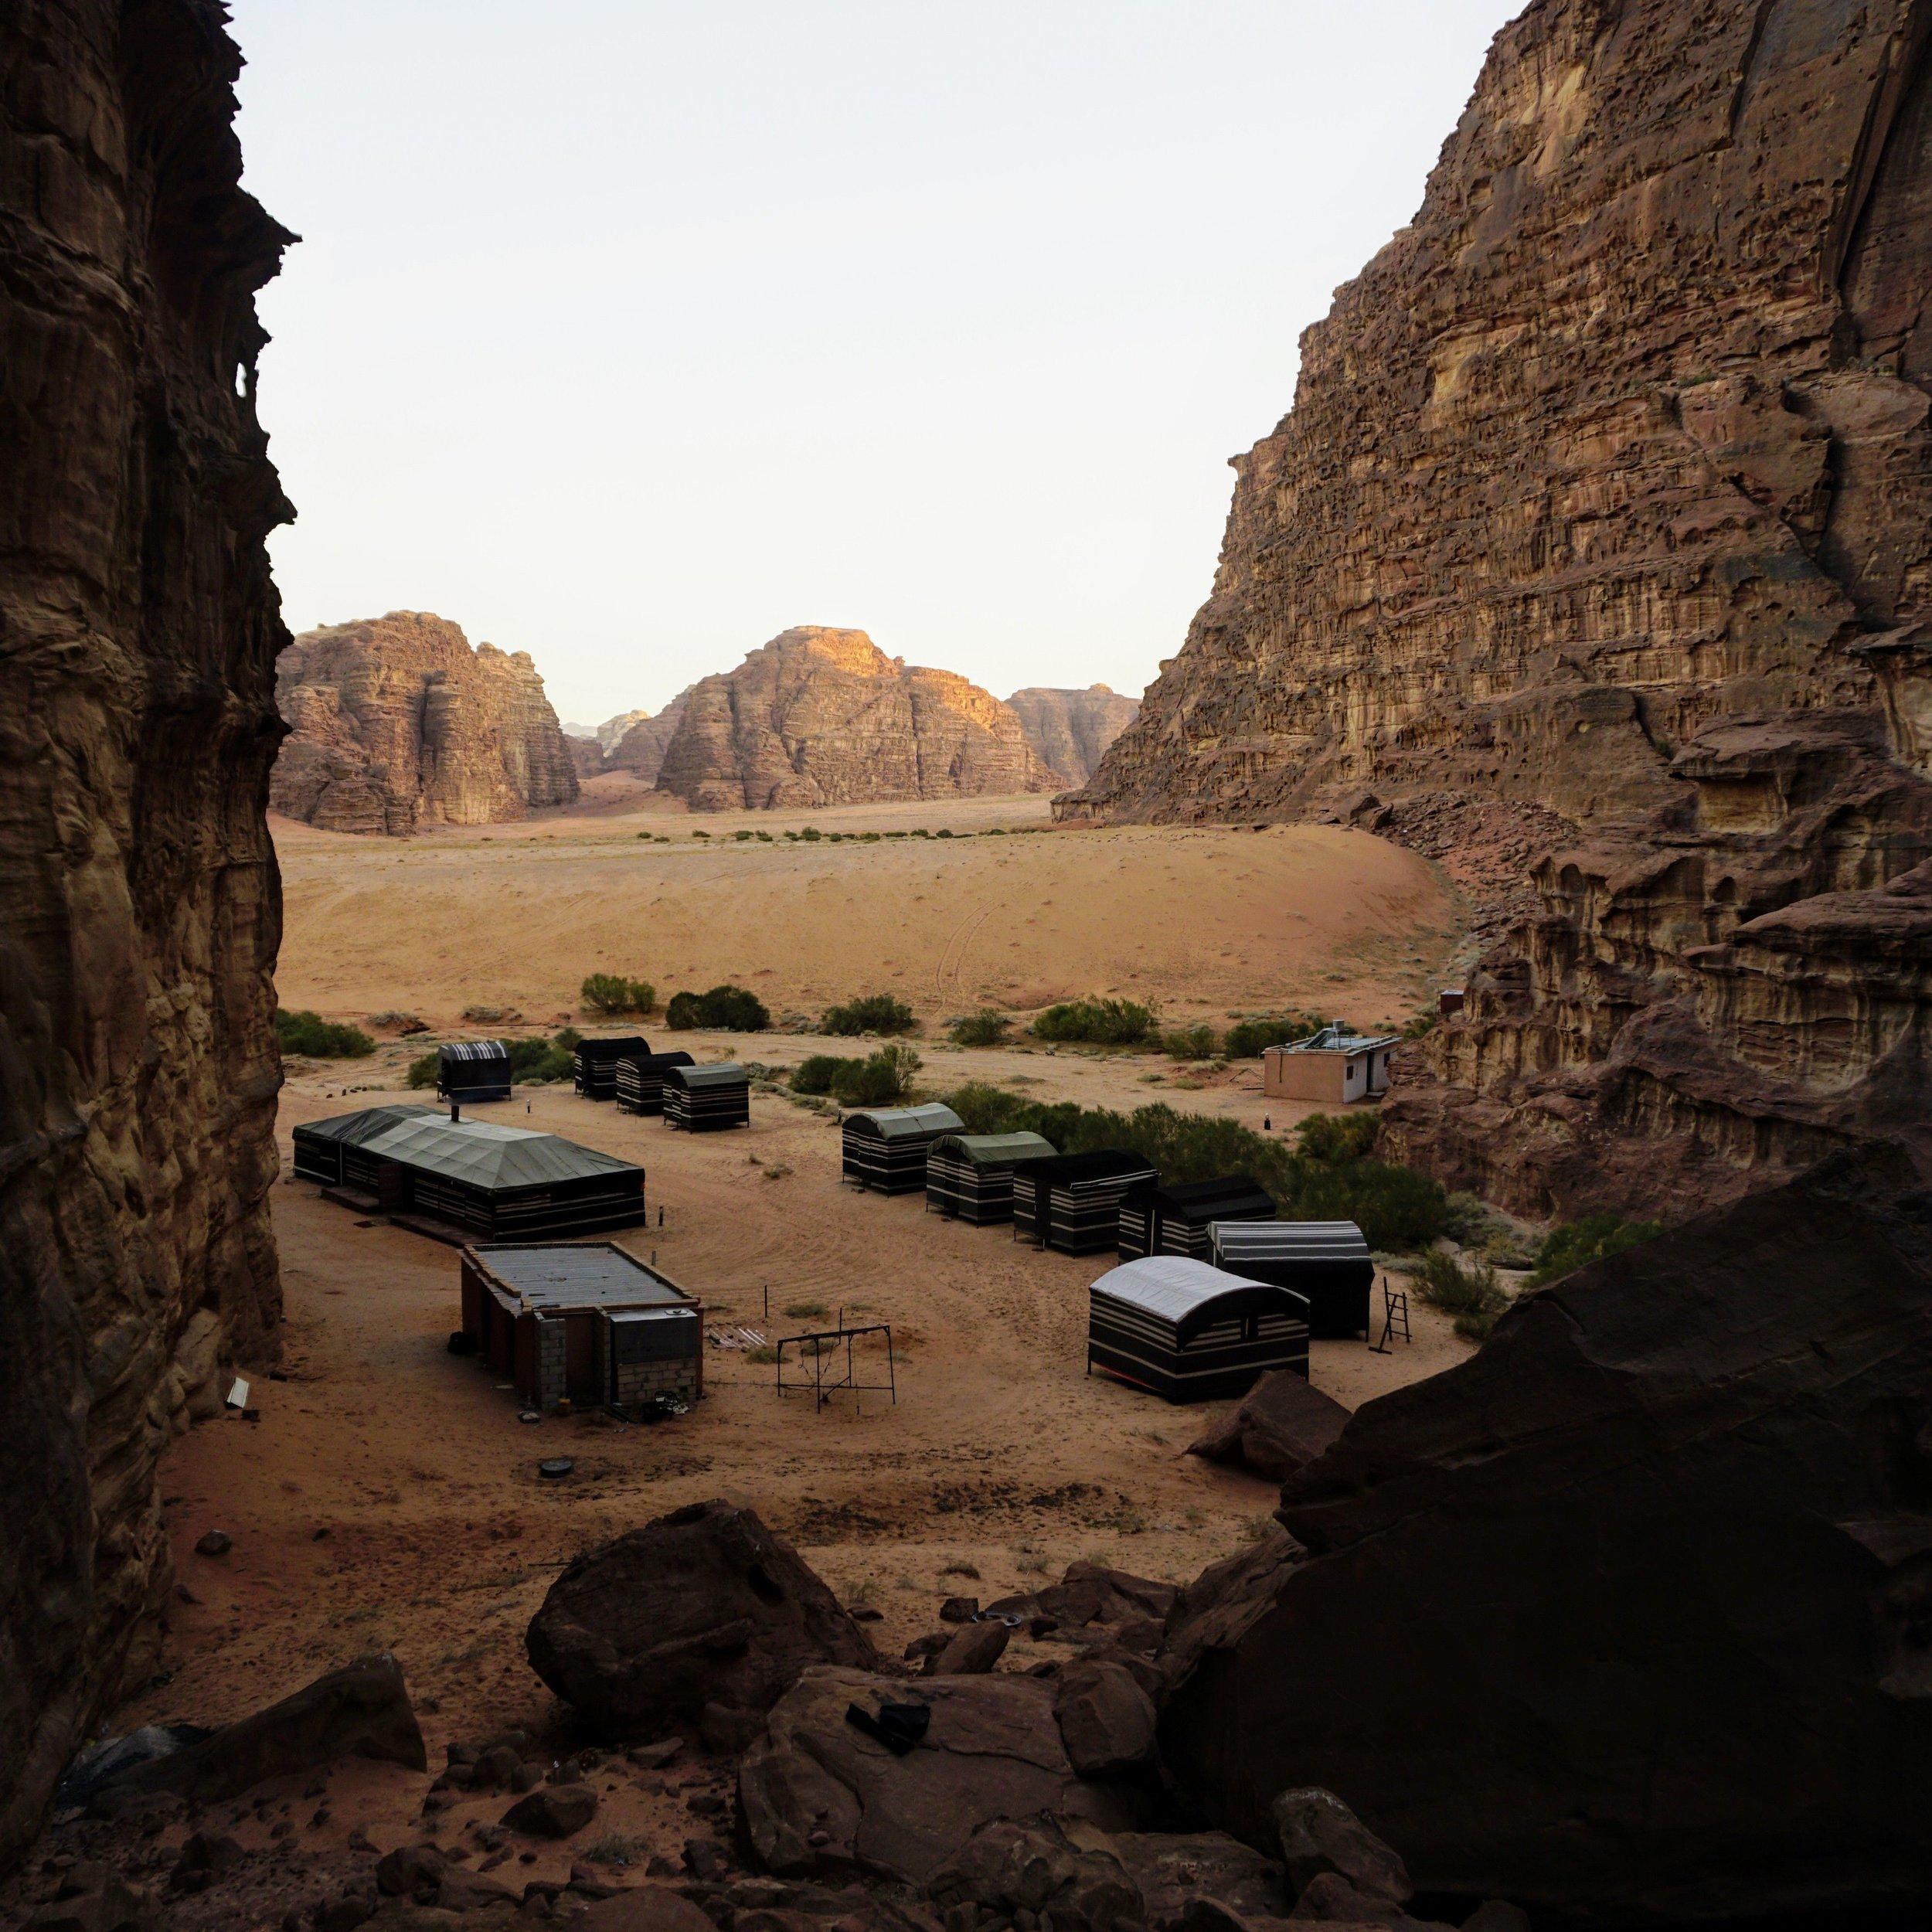 Wadi Rum Nature Tours & Camp